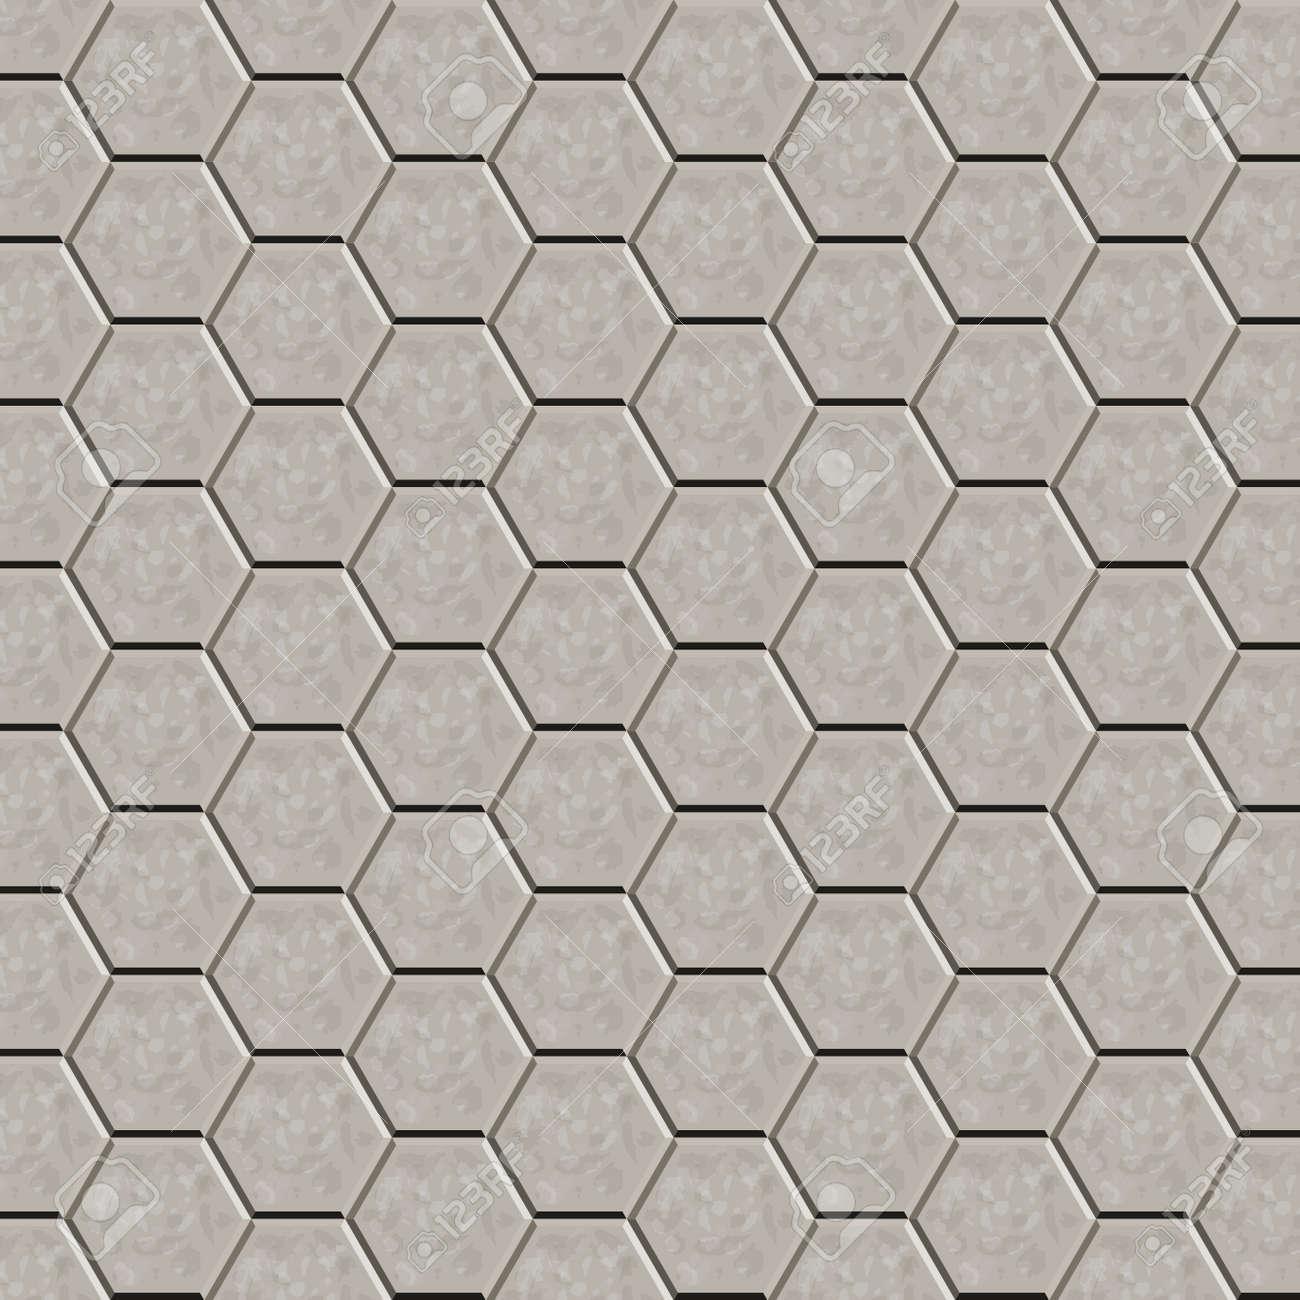 Hexagon tile floor image of white hexagon tile floor bathroom 3d hexagon tiles pattern for decoration and design tile floor seamless pattern vector stock dailygadgetfo Choice Image